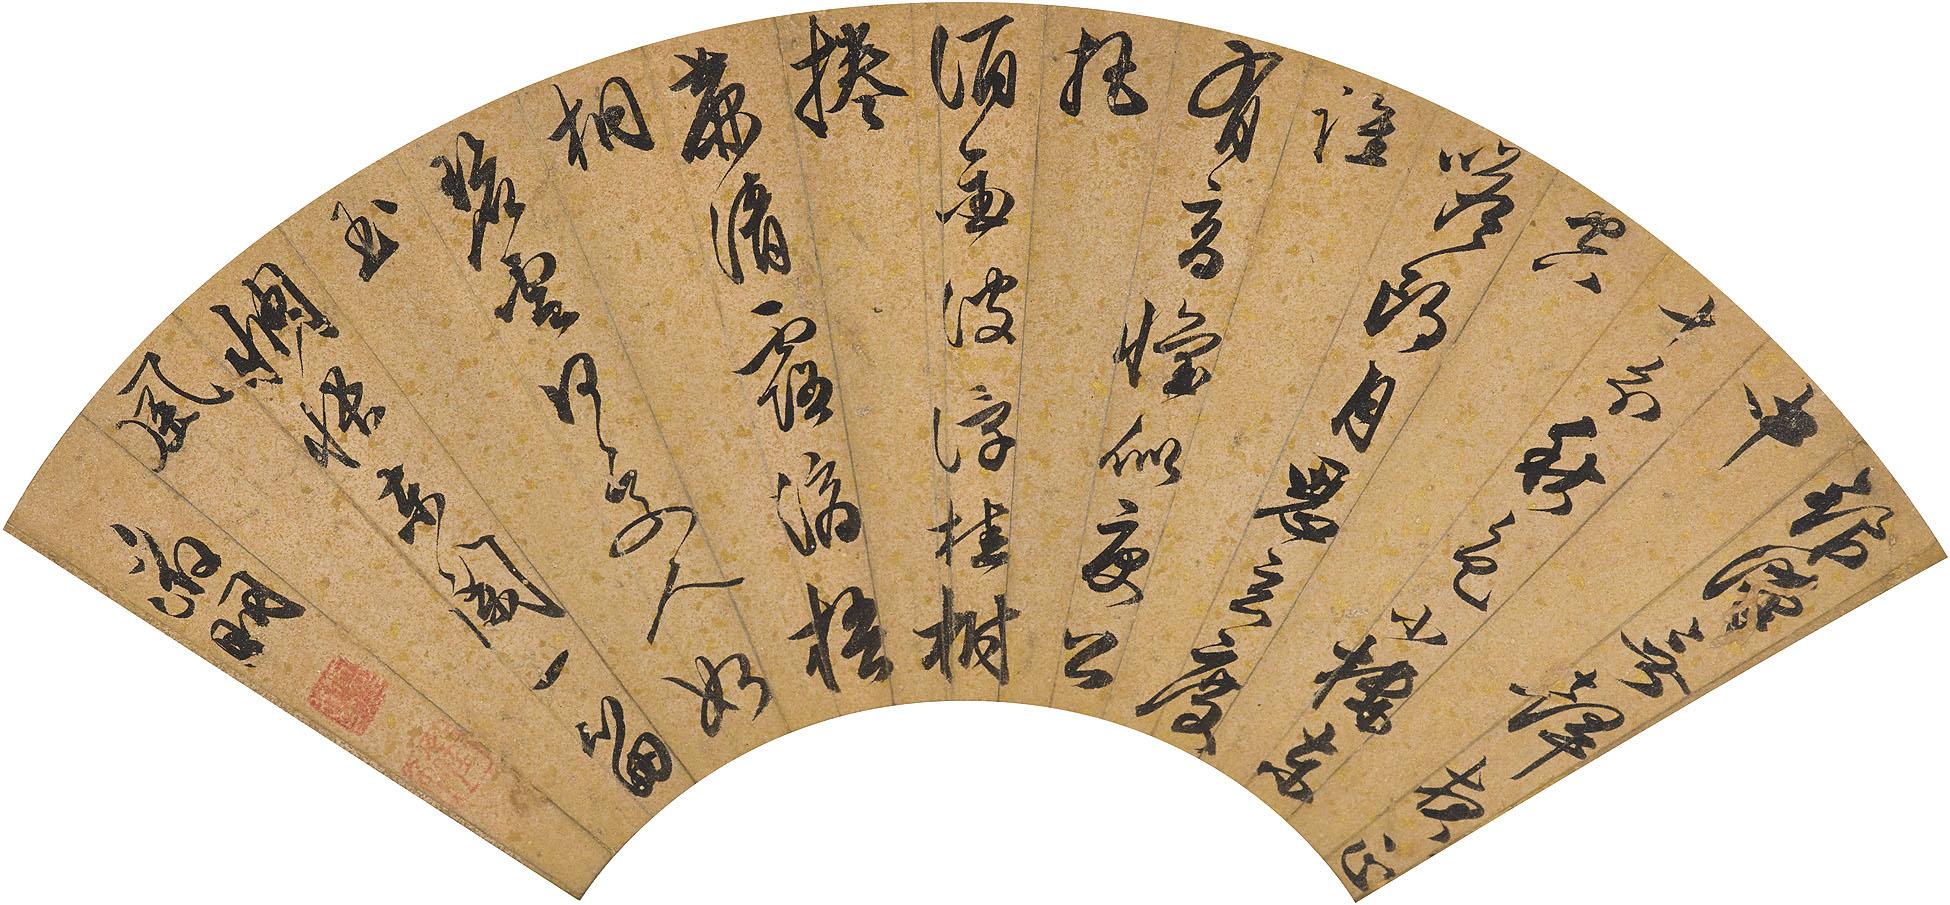 Calligraphy in Running-Cursive Script